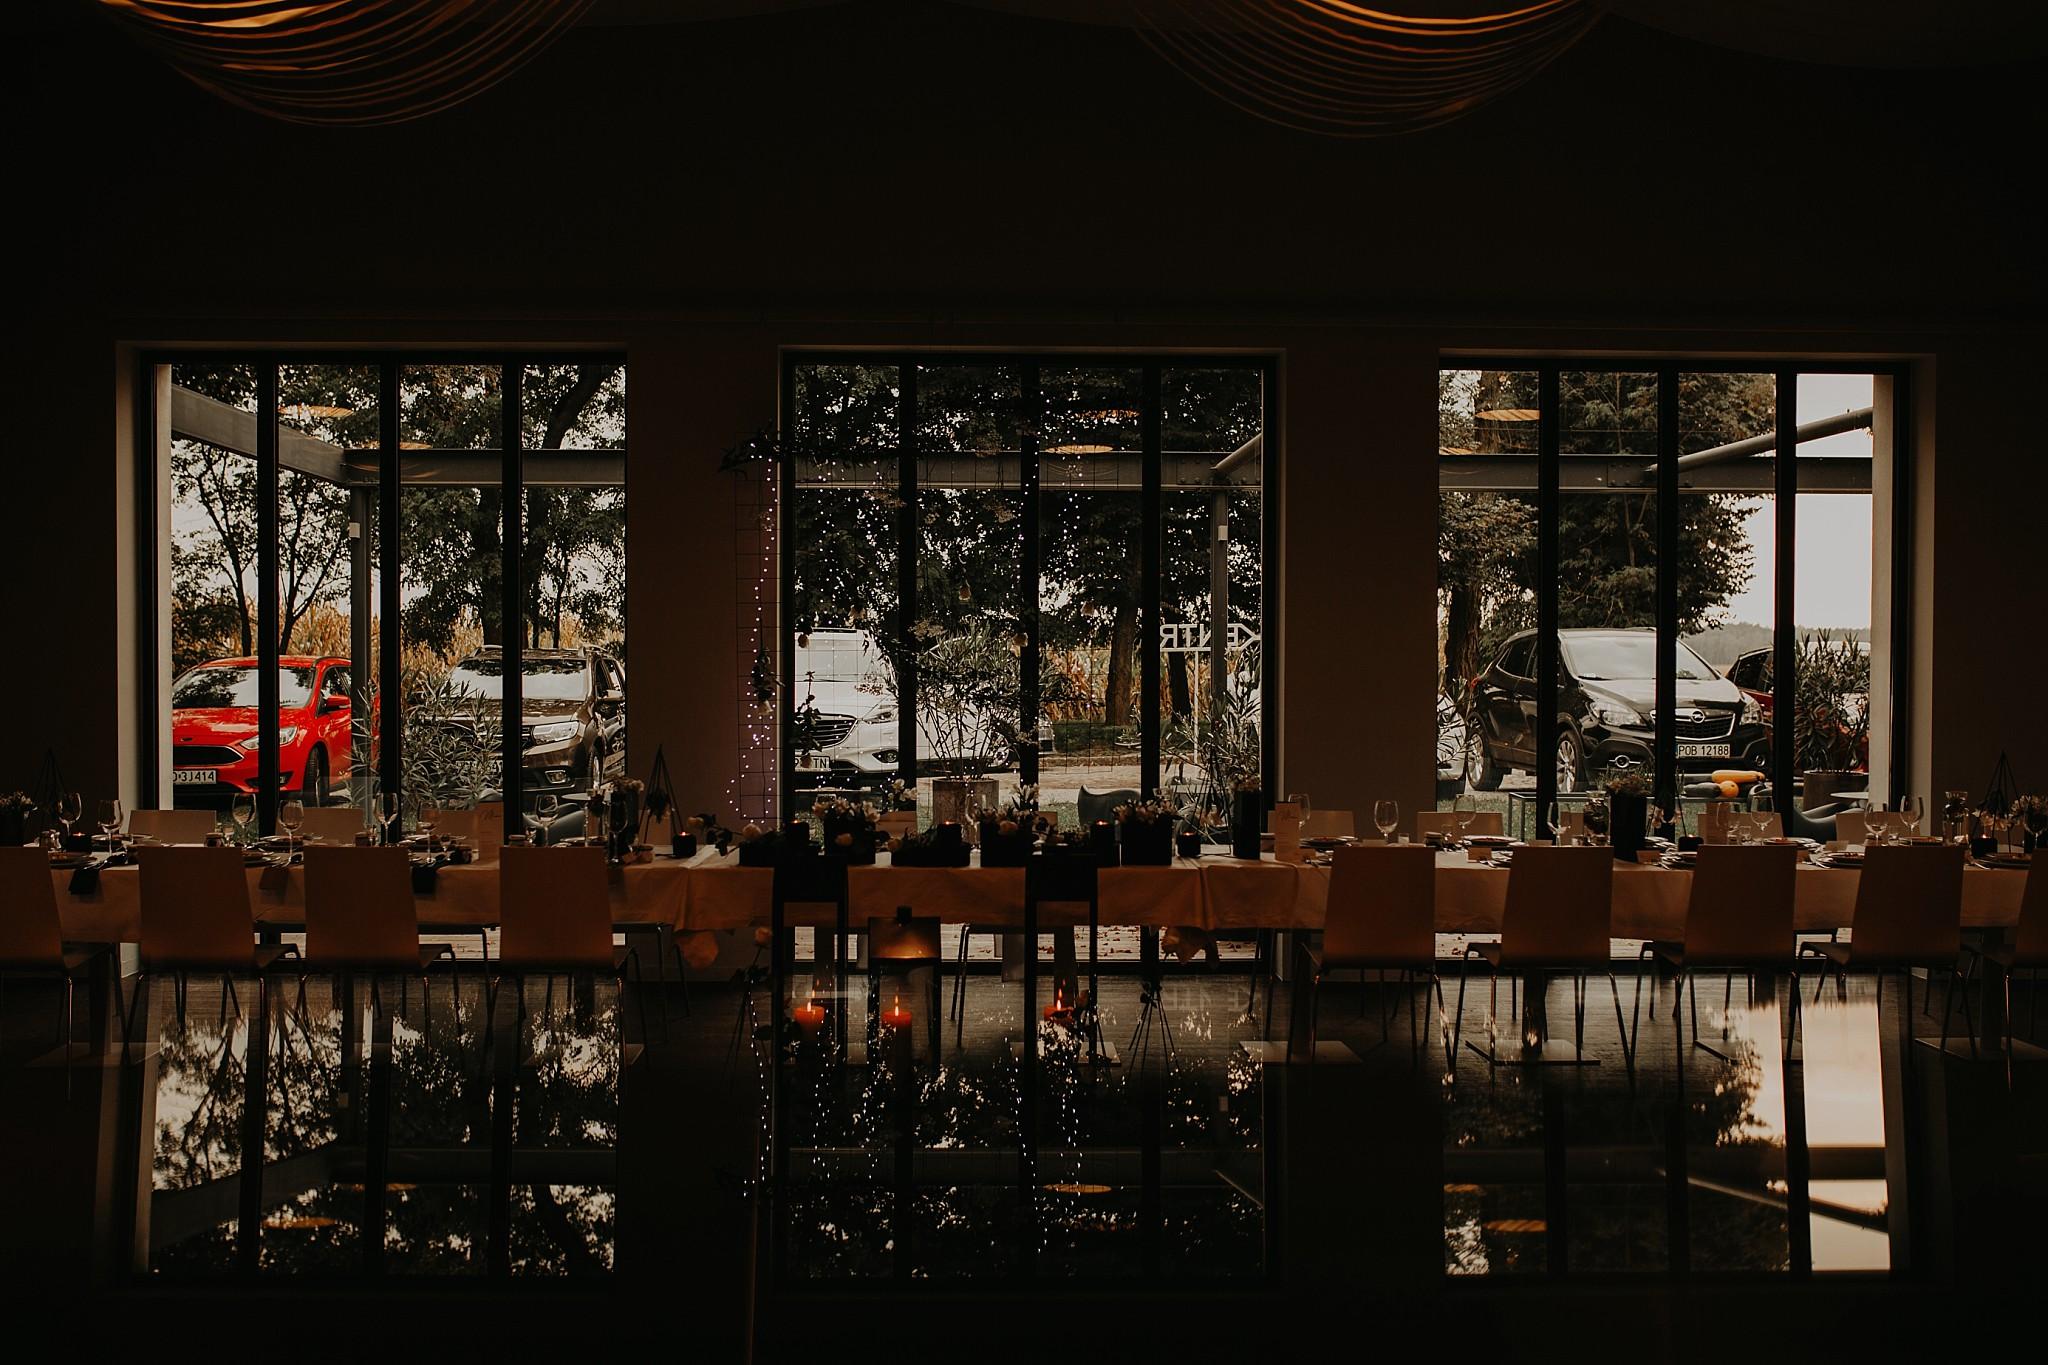 fotograf poznan wesele dobra truskawka piekne wesele pod poznaniem wesele w dobrej truskawce piekna para mloda slub marzen slub koronawirus slub listopad wesele koronawirus 244